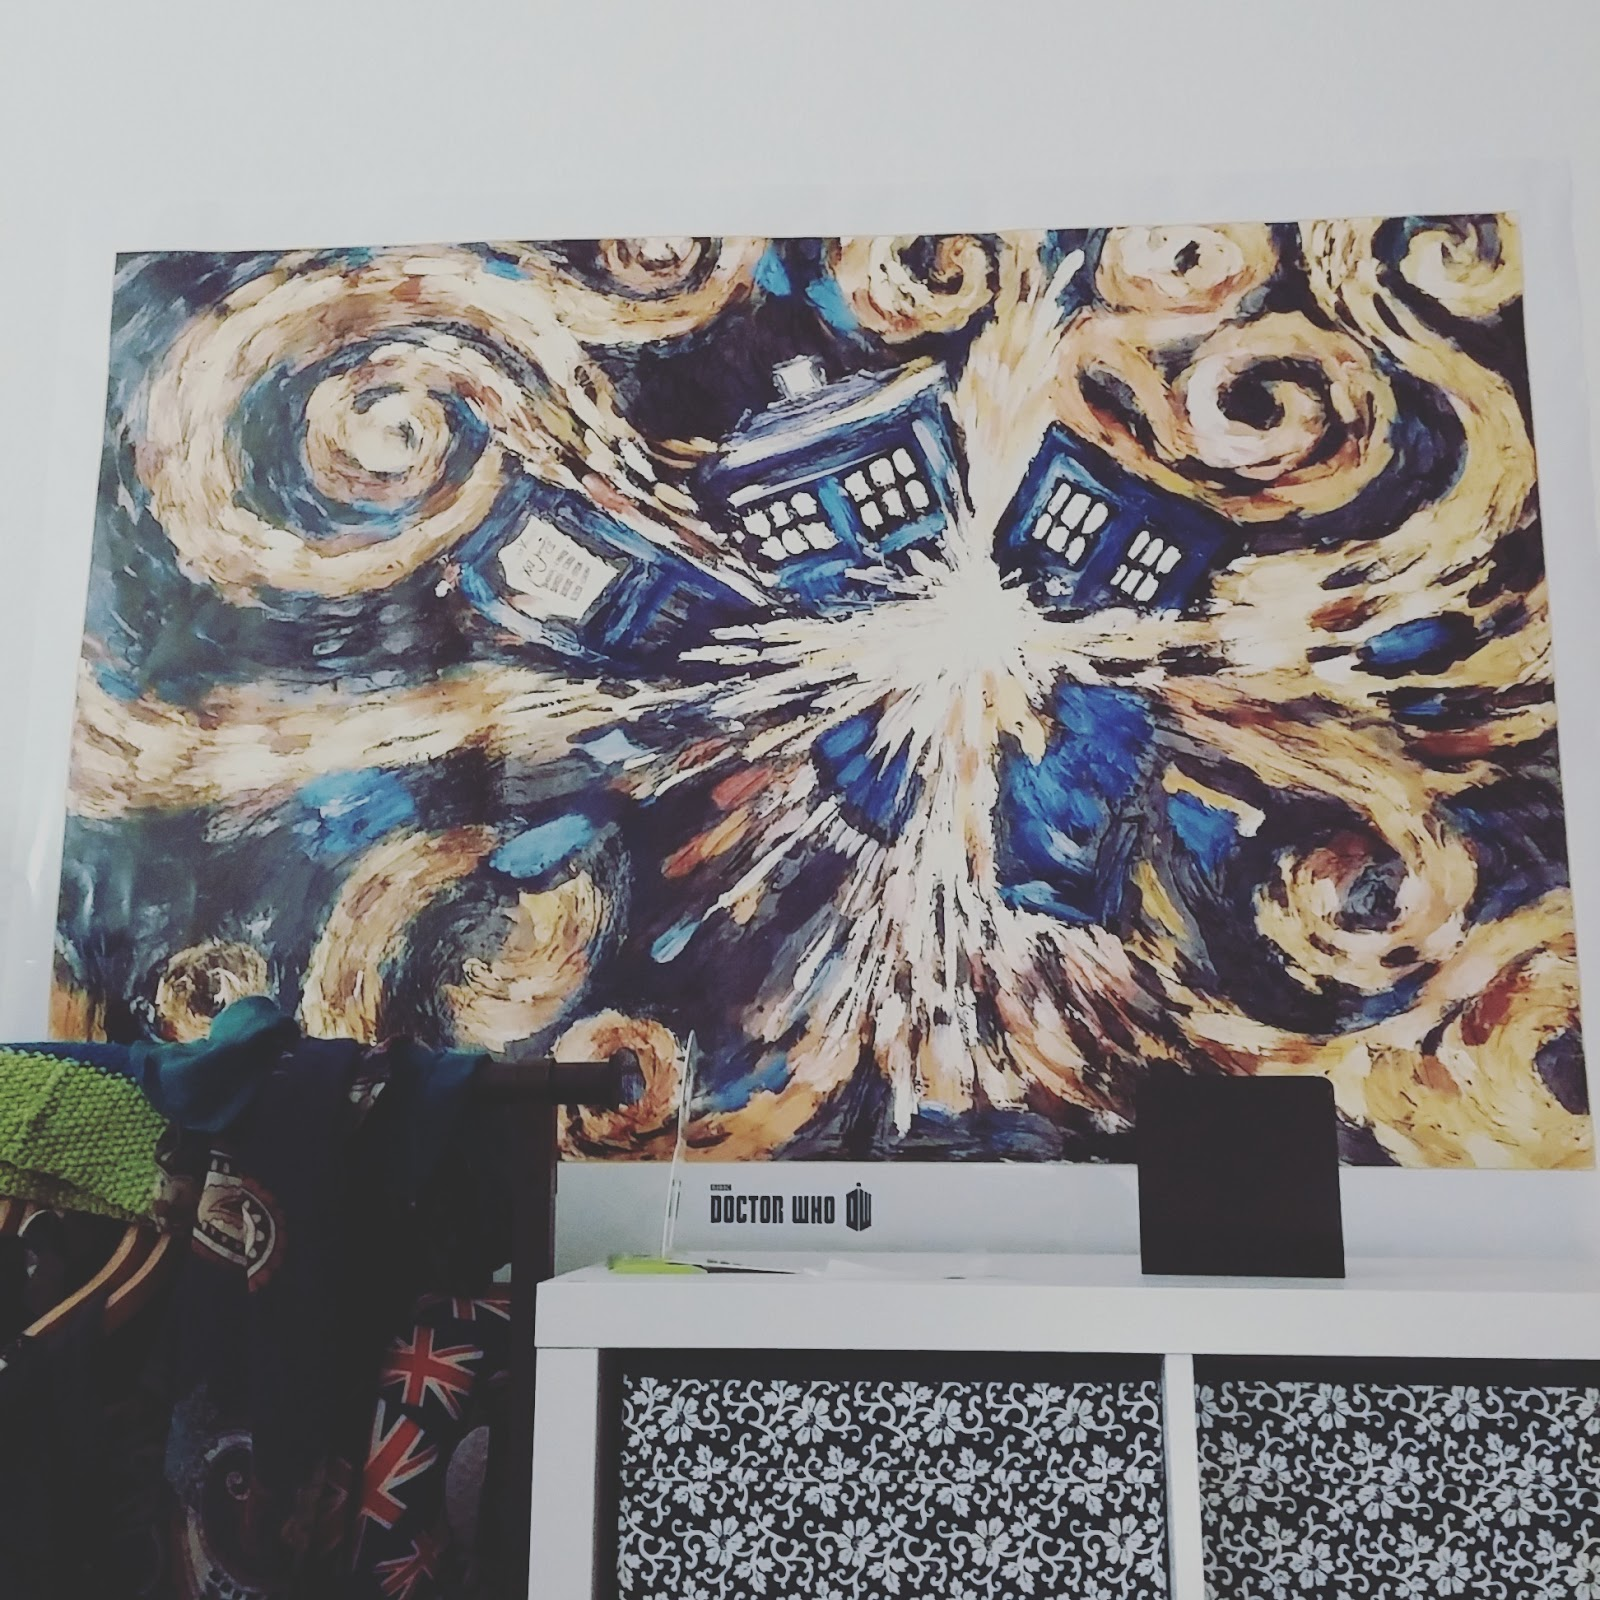 Geek-Stöckchen Doctor Who Poster